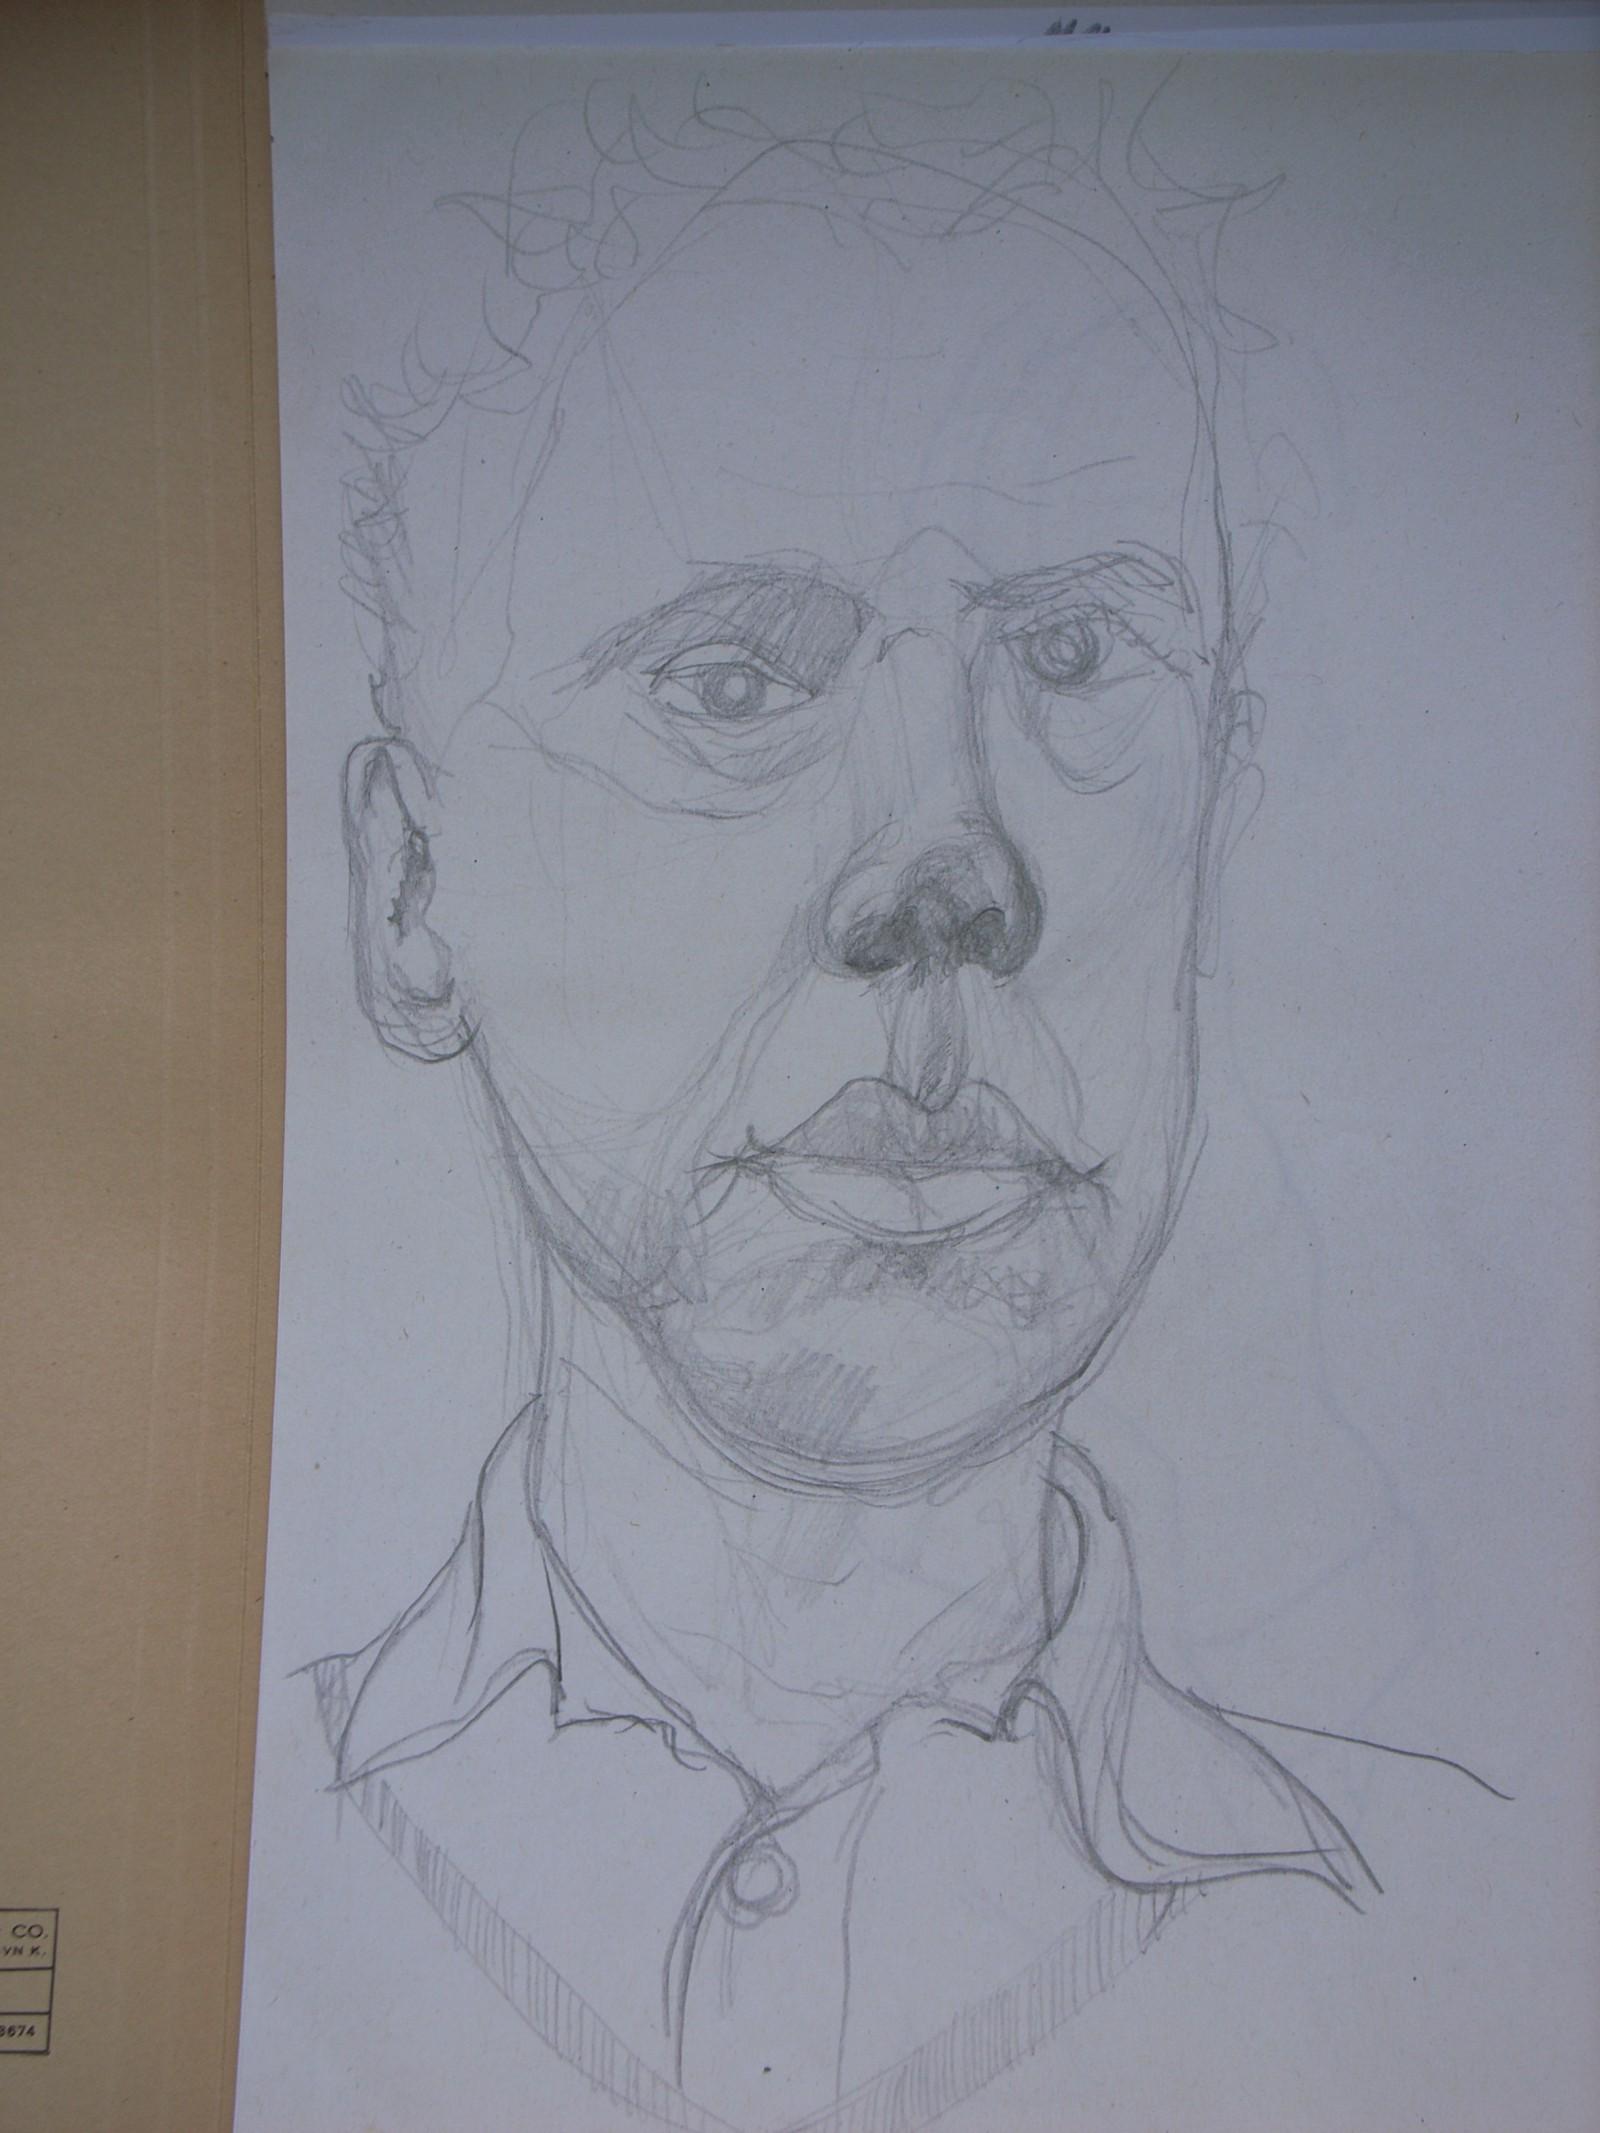 Design School (Croquis) sketch